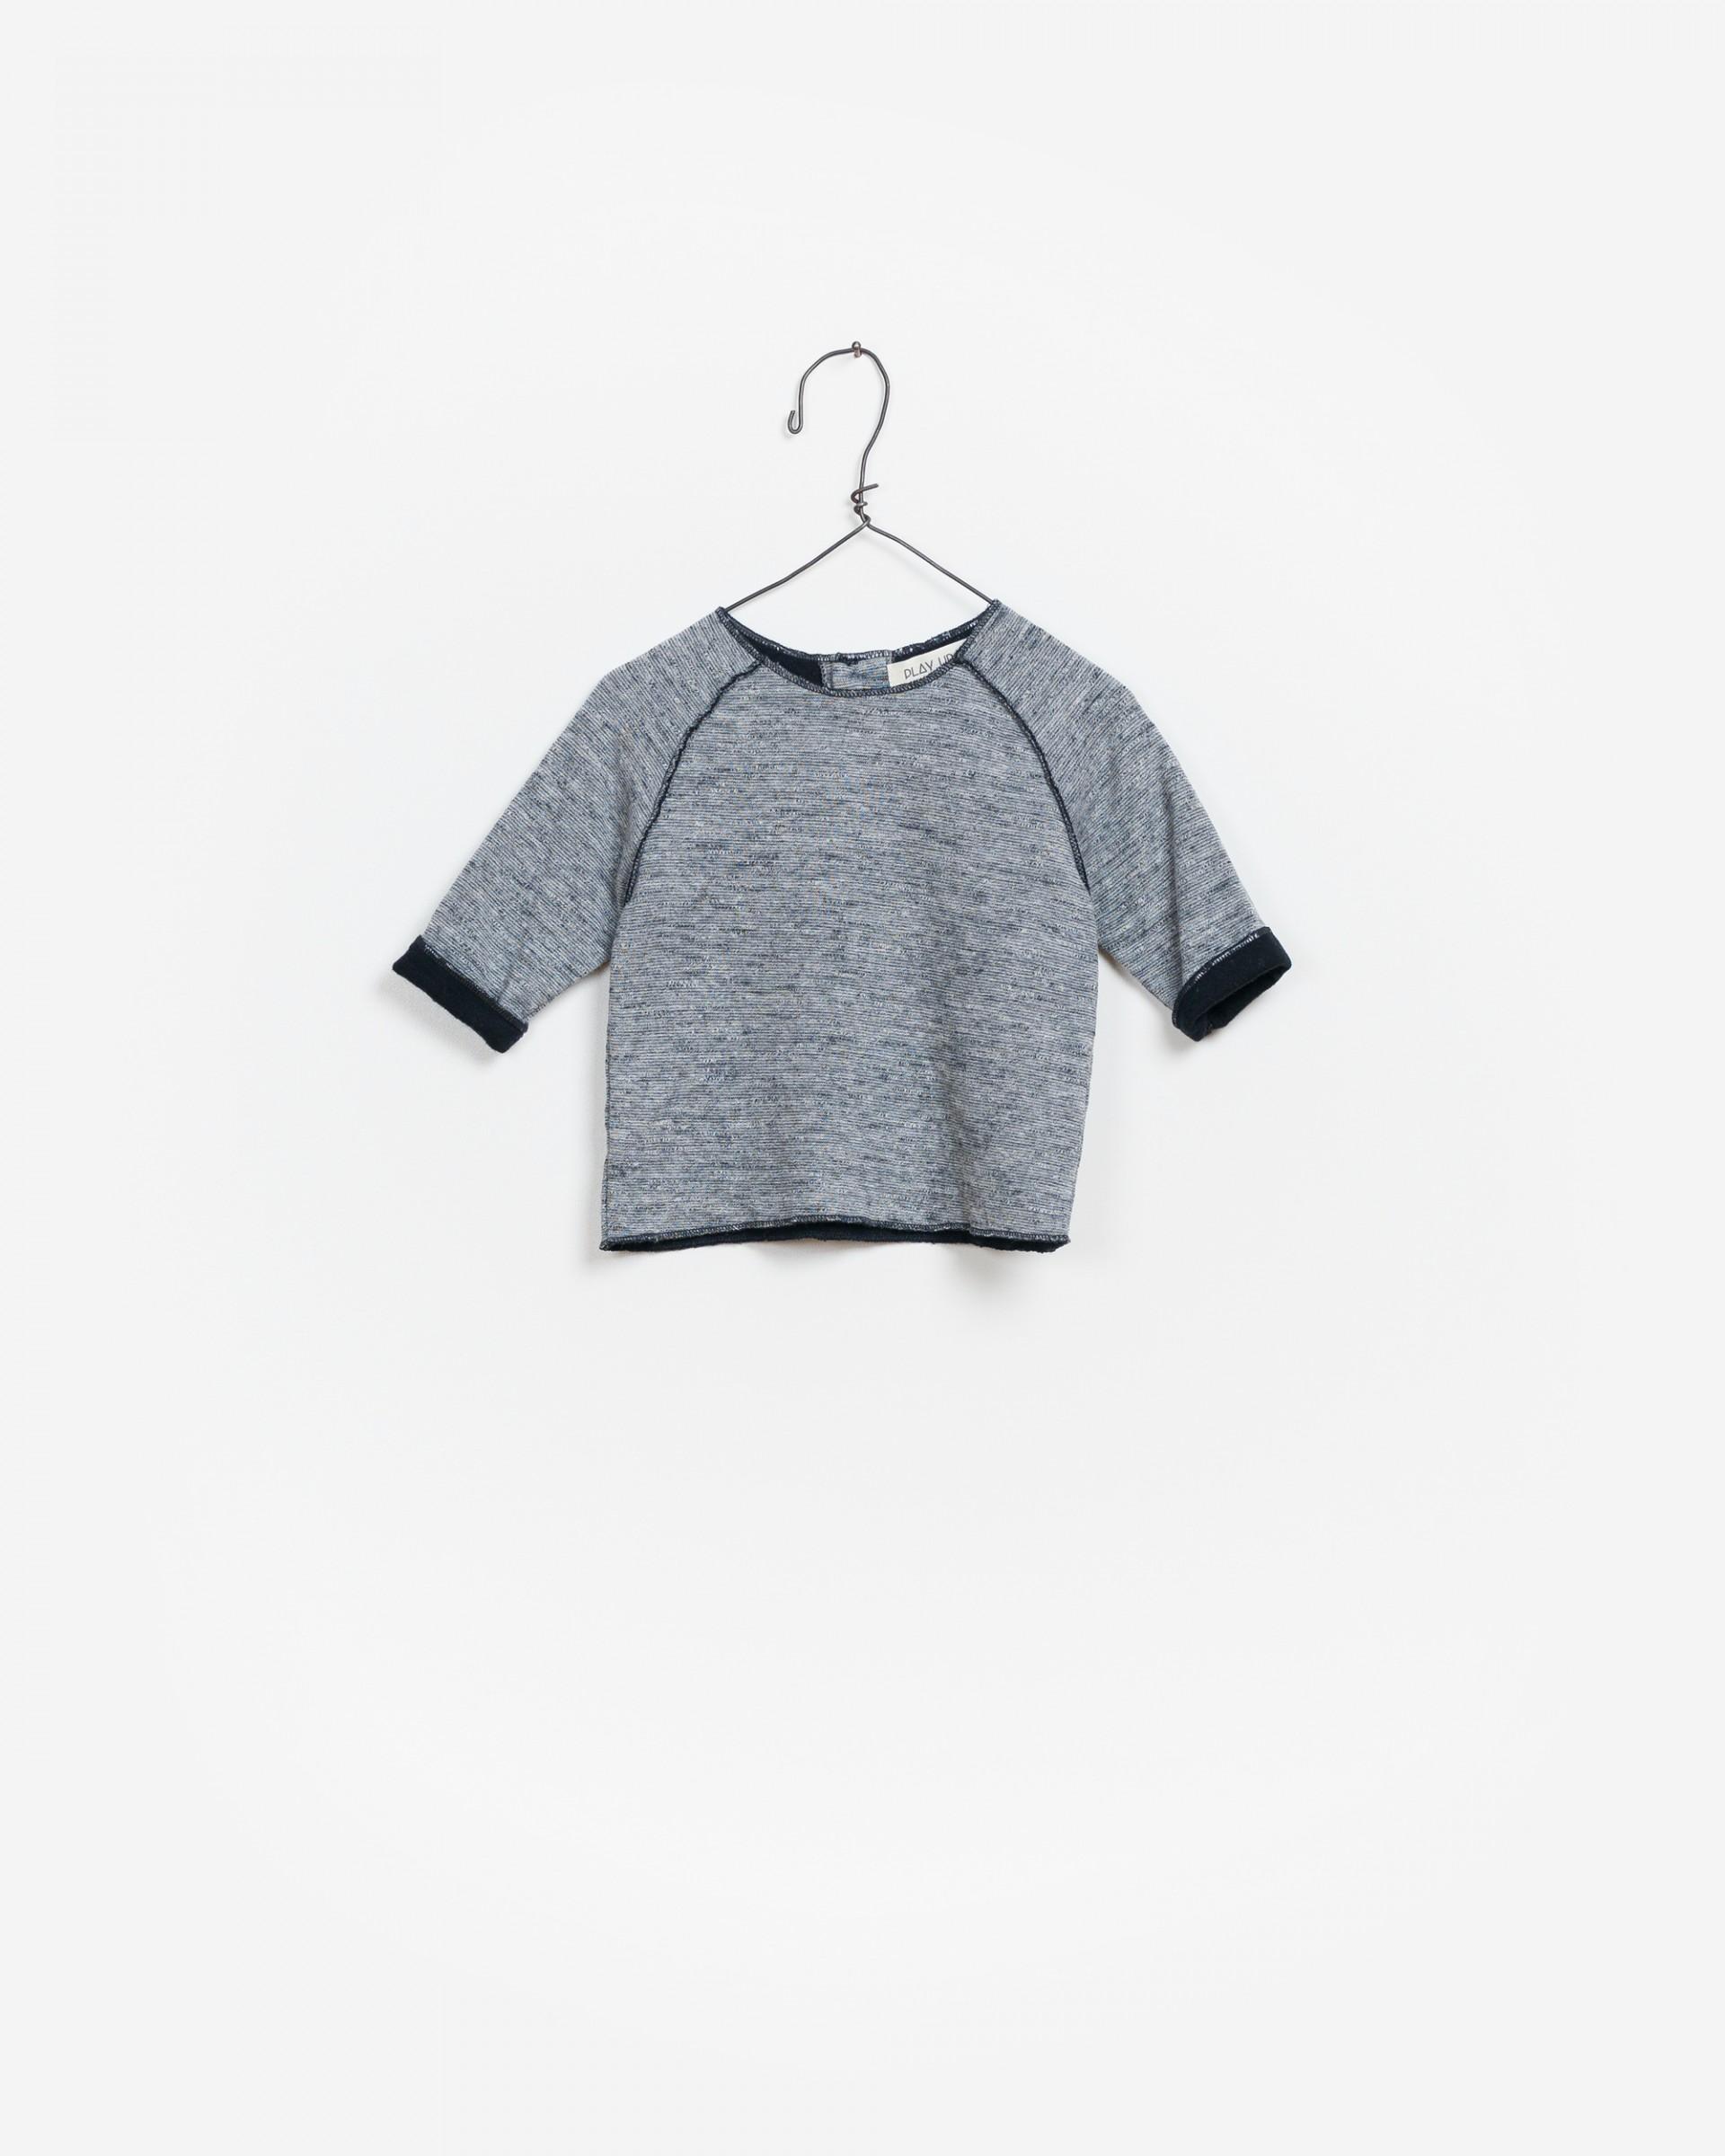 Interlock Sweater